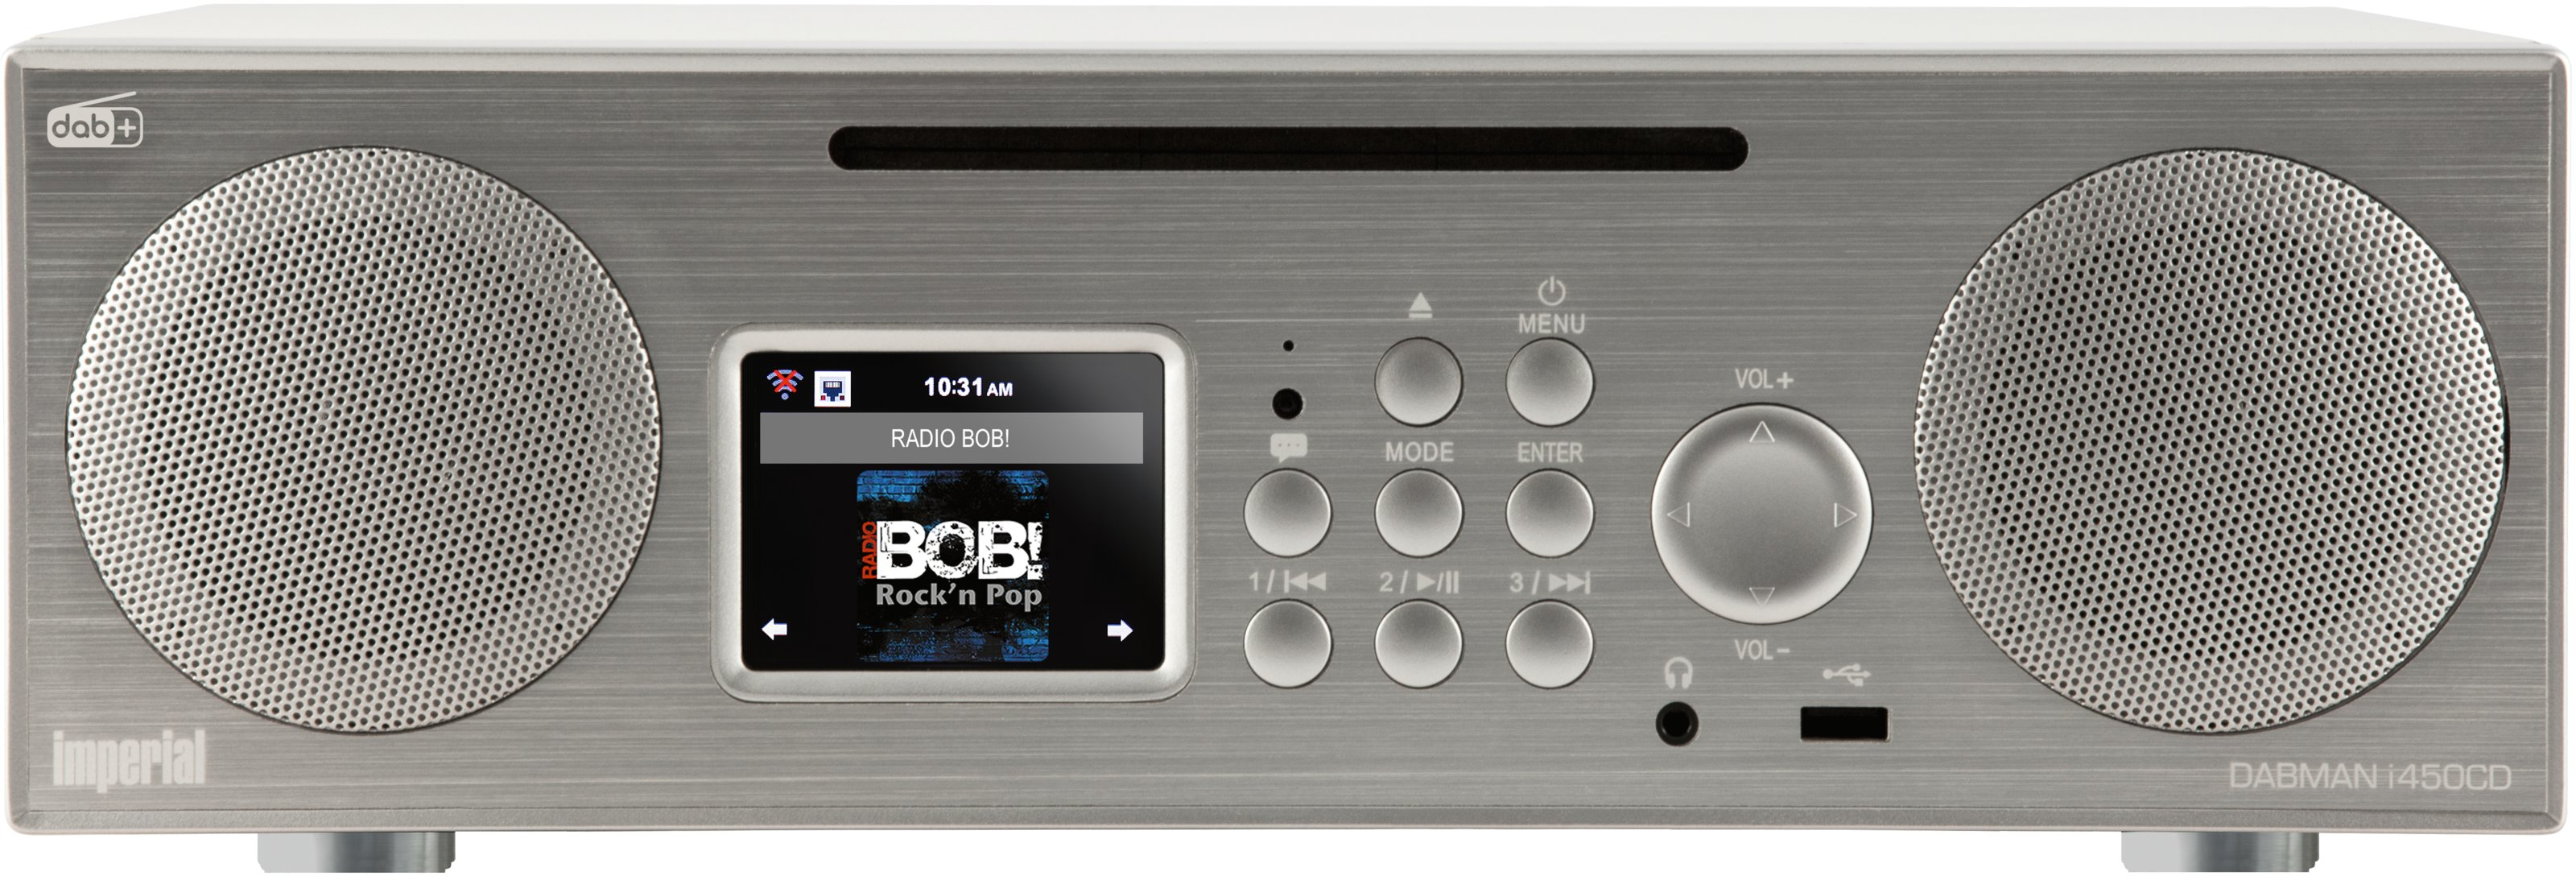 Telestar DABMAN i450 CD - Persönlich - Analog - DAB,DAB+,UKW - 174 - 240 MHz - 10 W - TFT